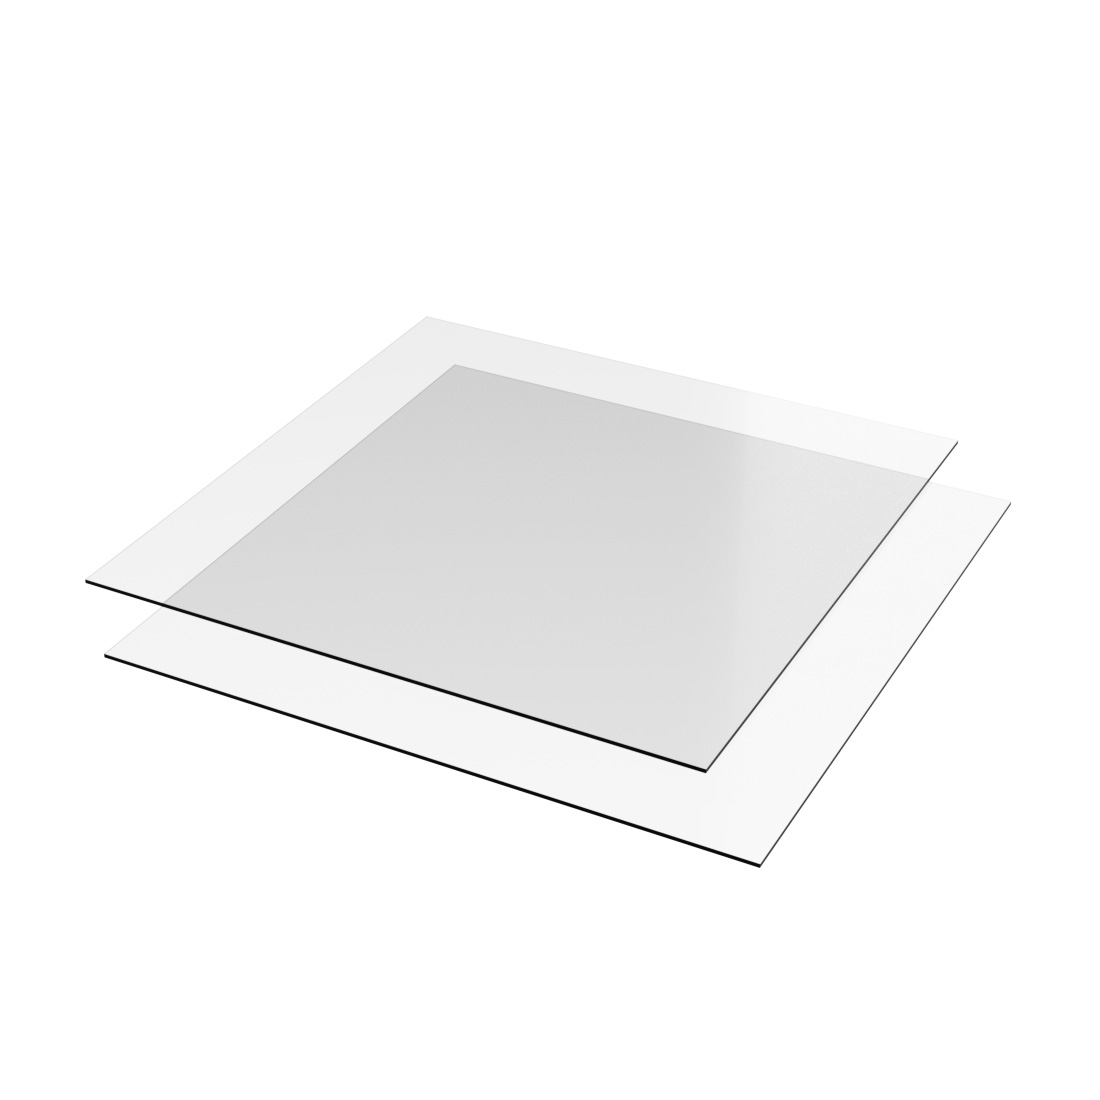 Vikunyl PVC Helder 0015 Glans 1400x1000x0,14mm